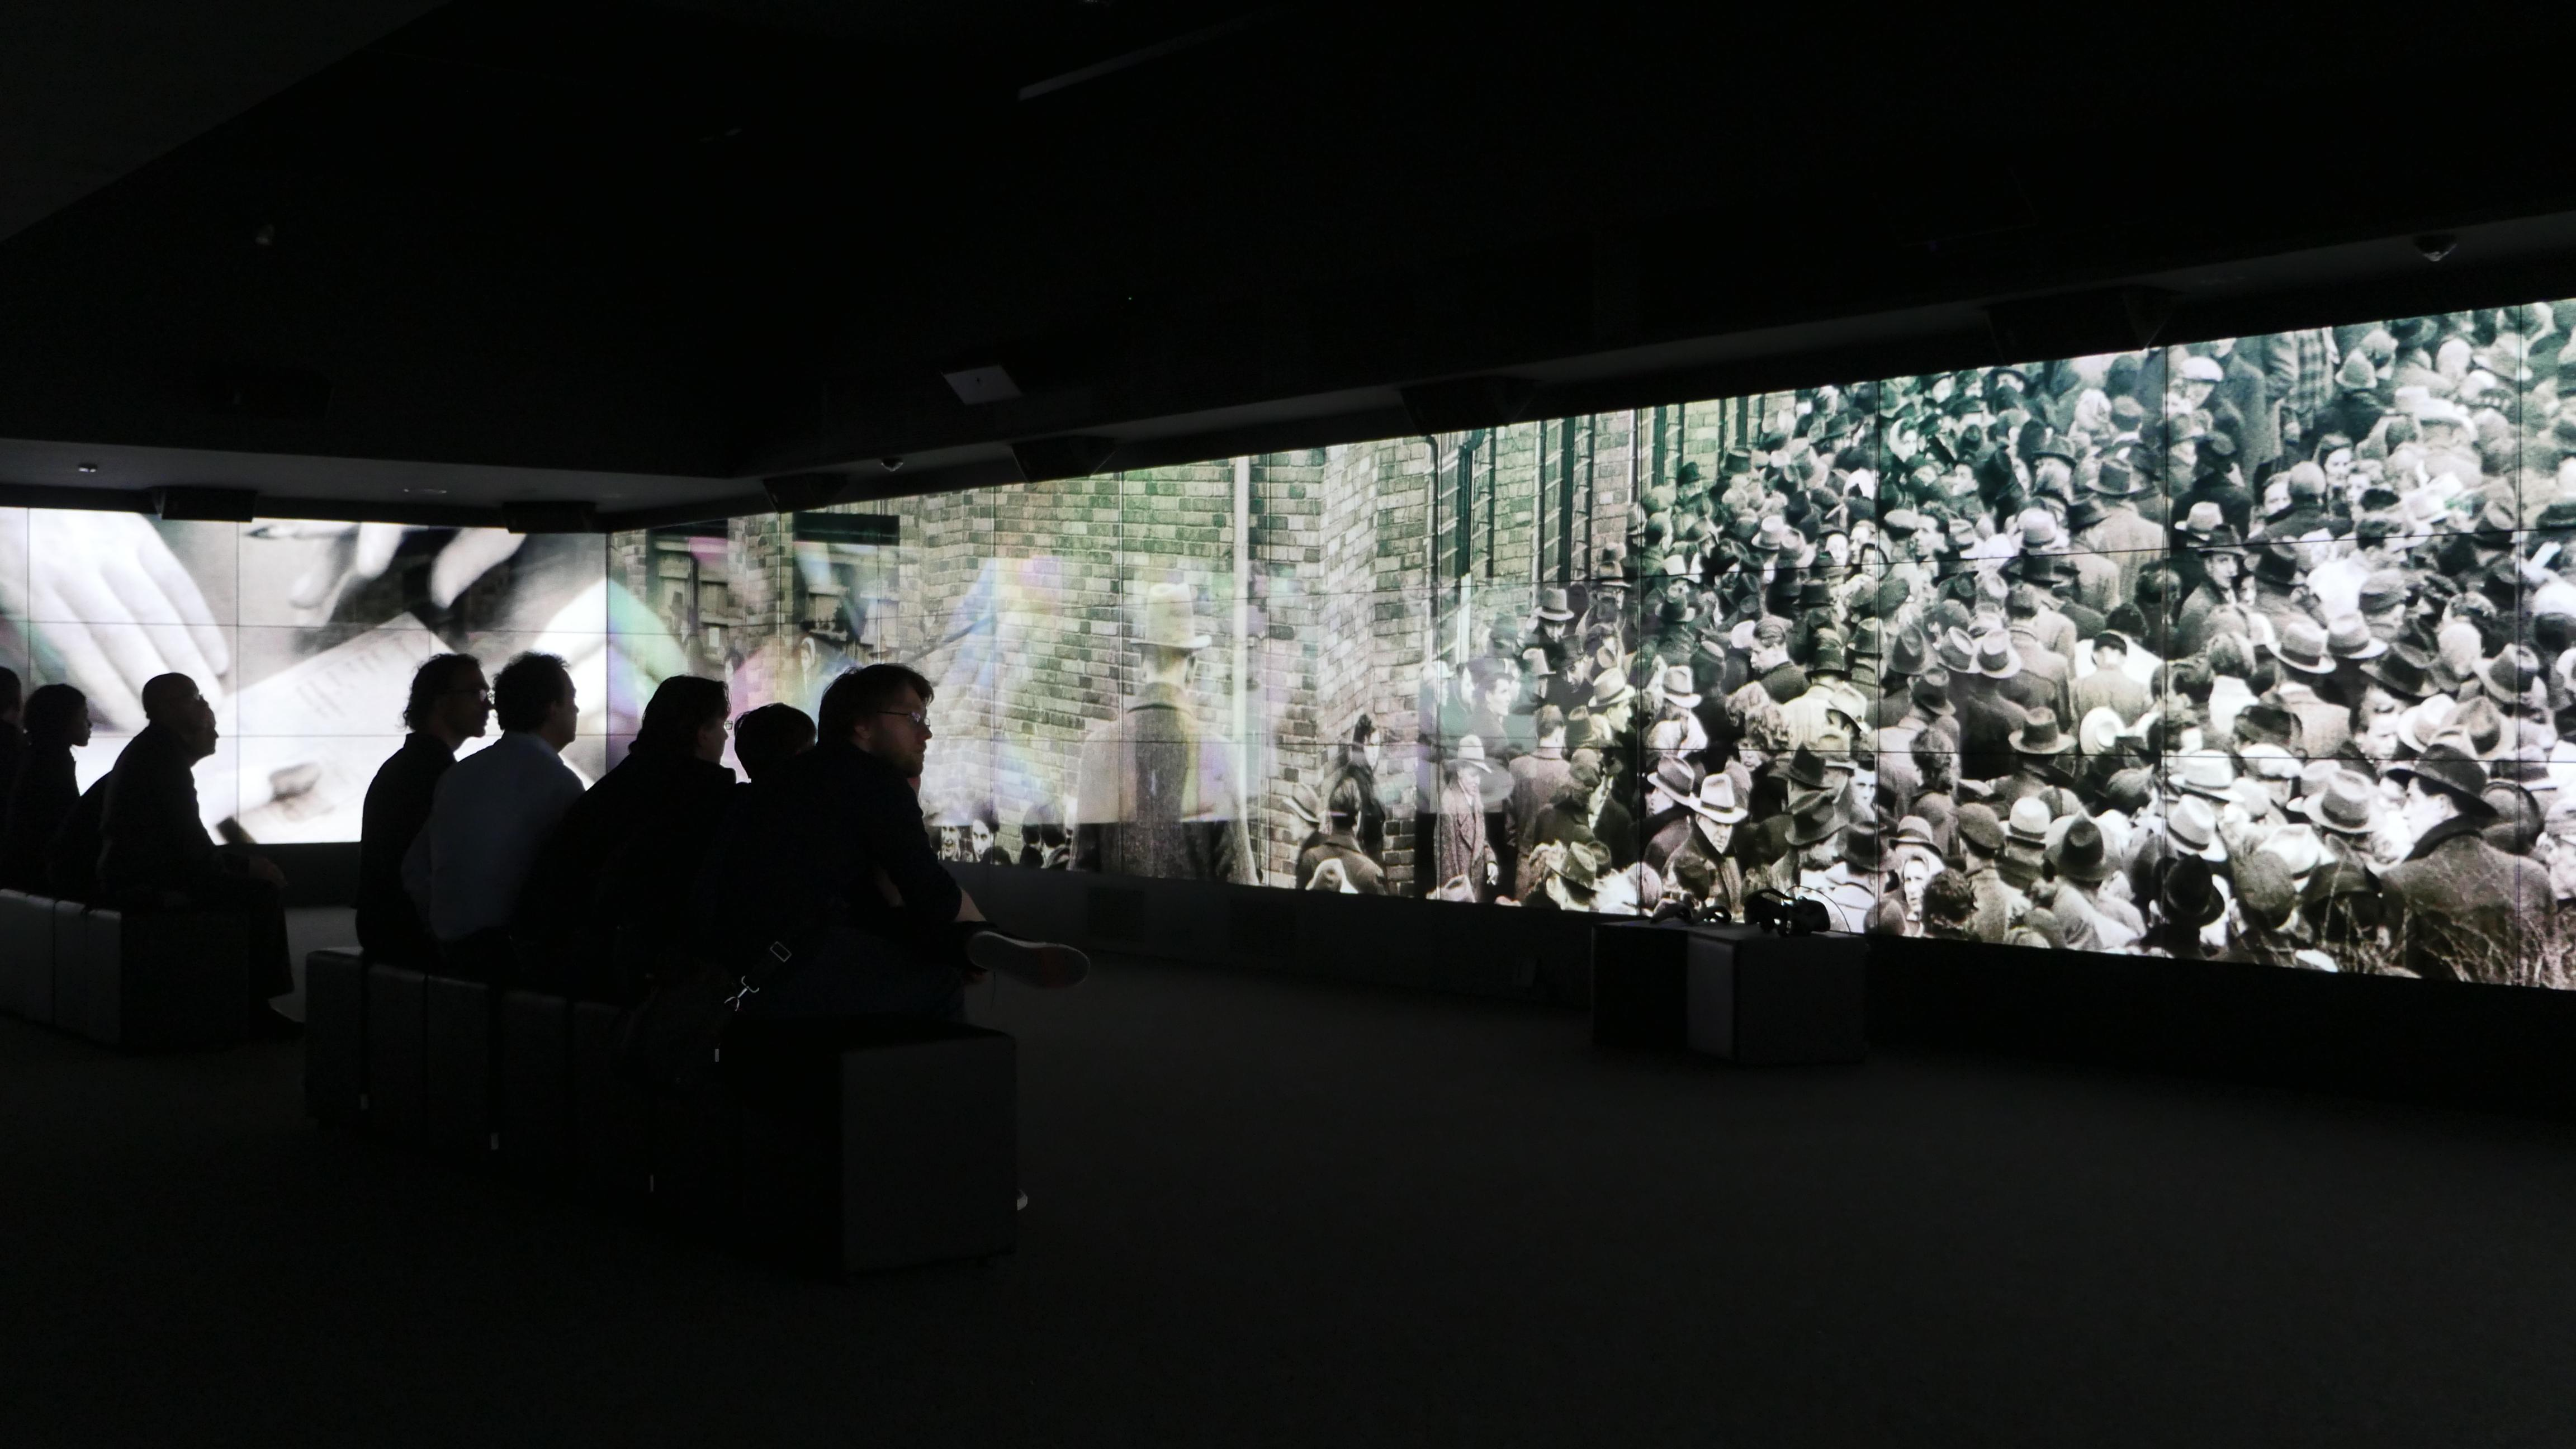 photo: videowall screens in the Brandenburg Gate Museum using 87 screens of Panasonic's